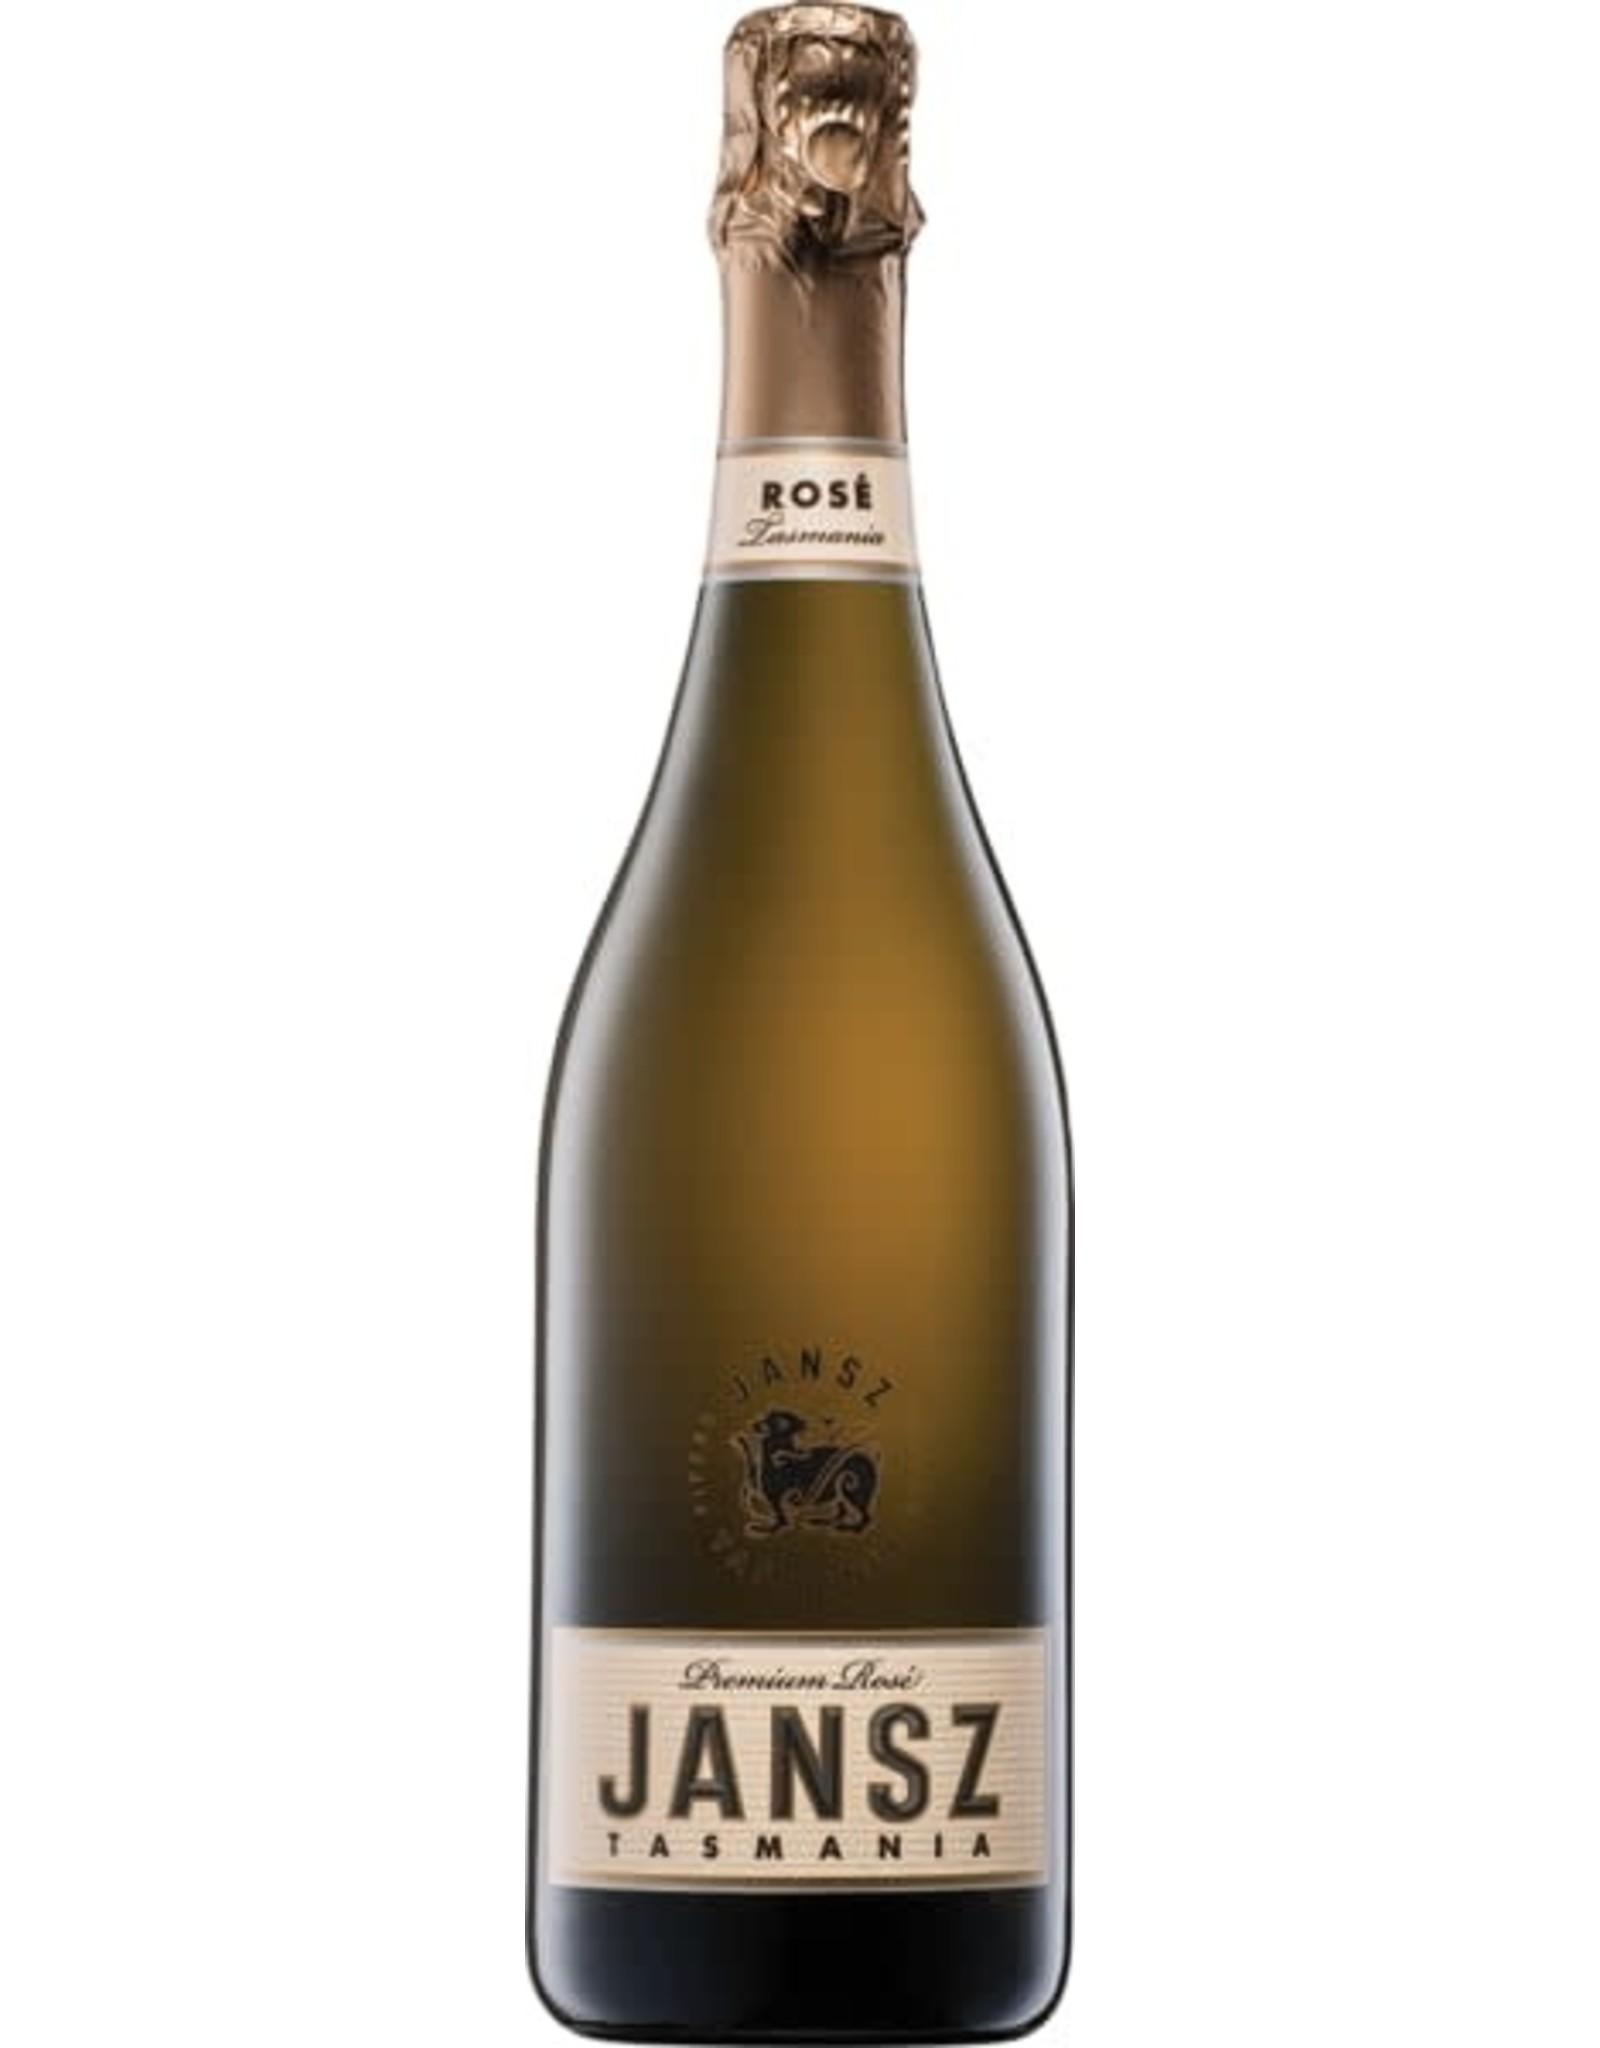 Jansz Jansz Premium Rosé, Tazmania NV